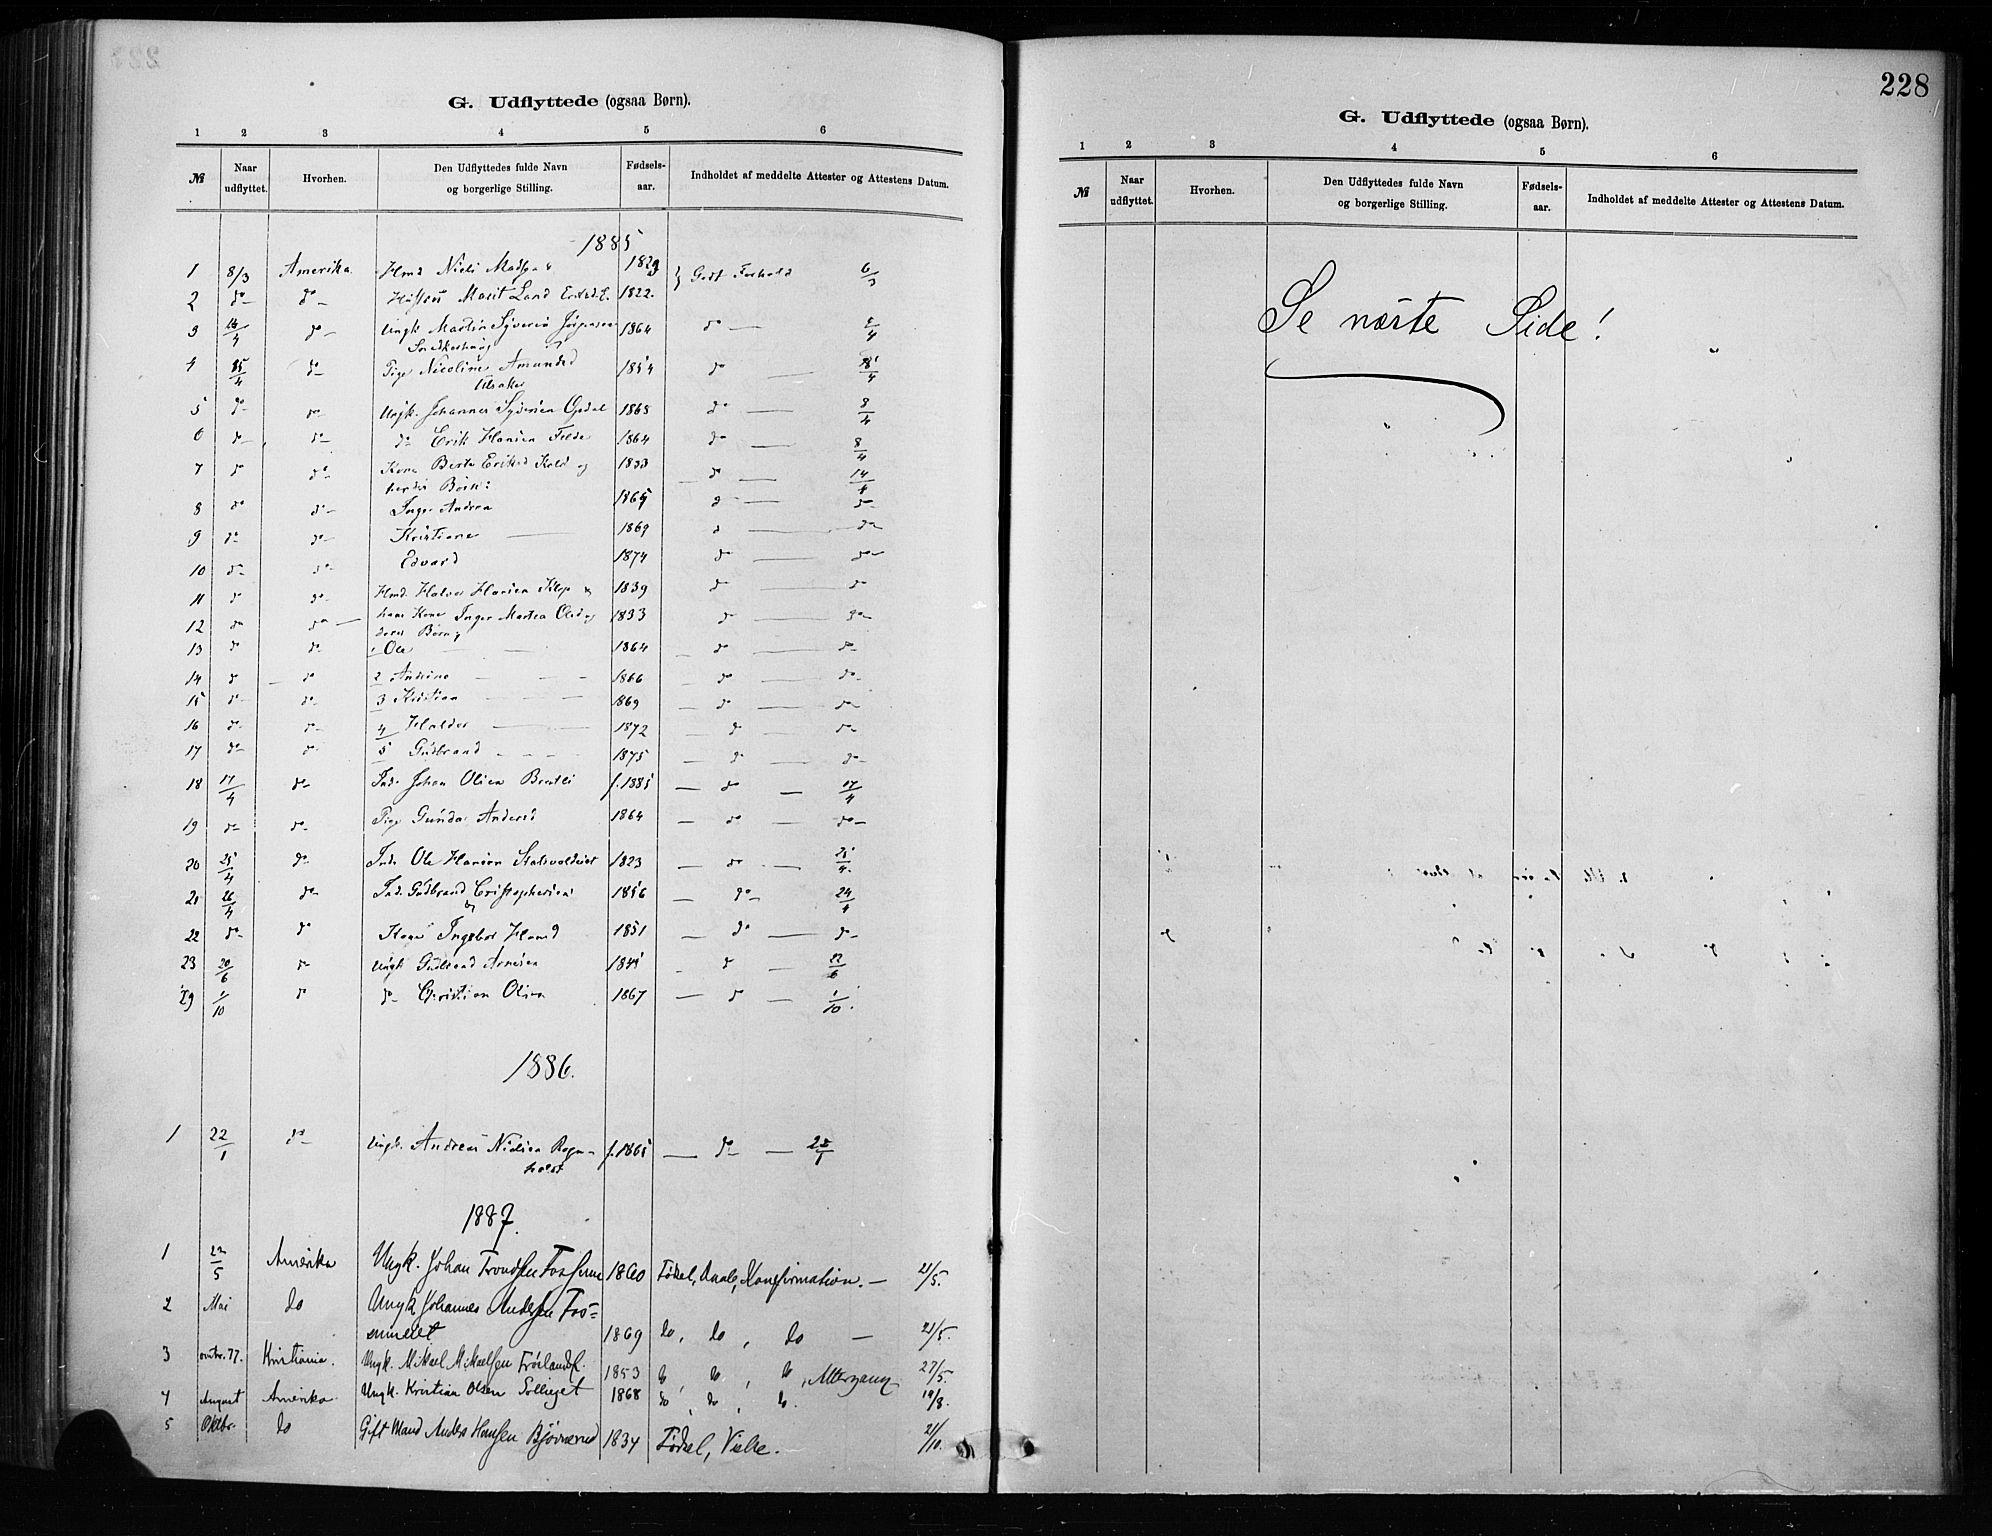 SAH, Nordre Land prestekontor, Ministerialbok nr. 4, 1882-1896, s. 228